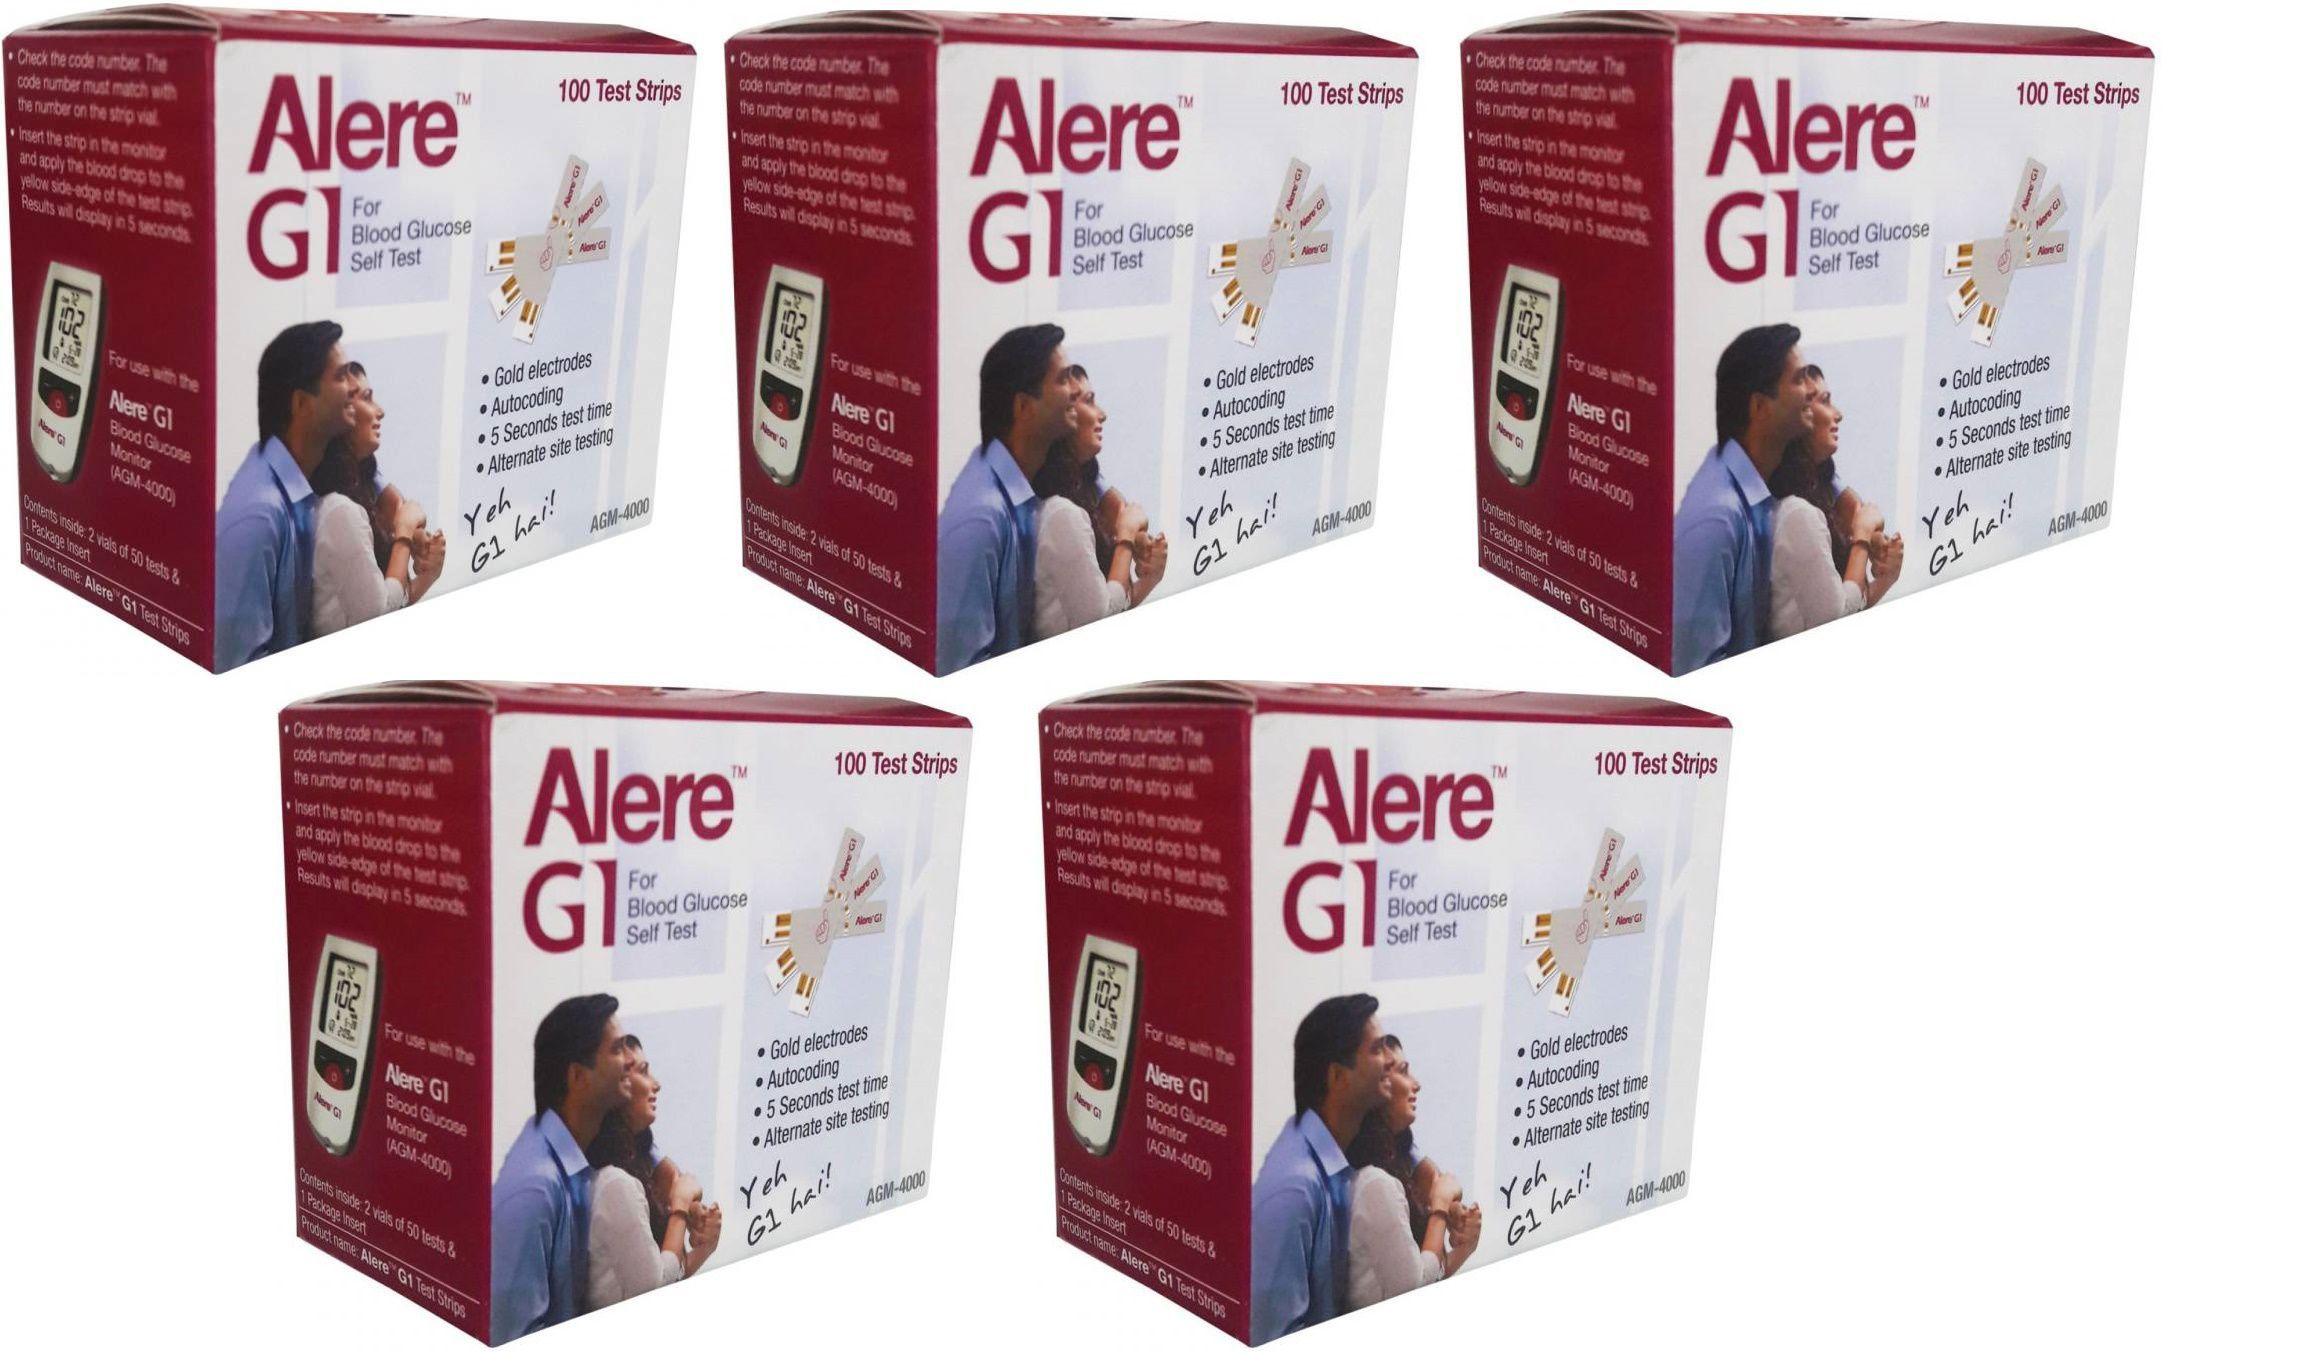 500 (100x5) Strips For Alere G1 Expiry:November 2019 Red